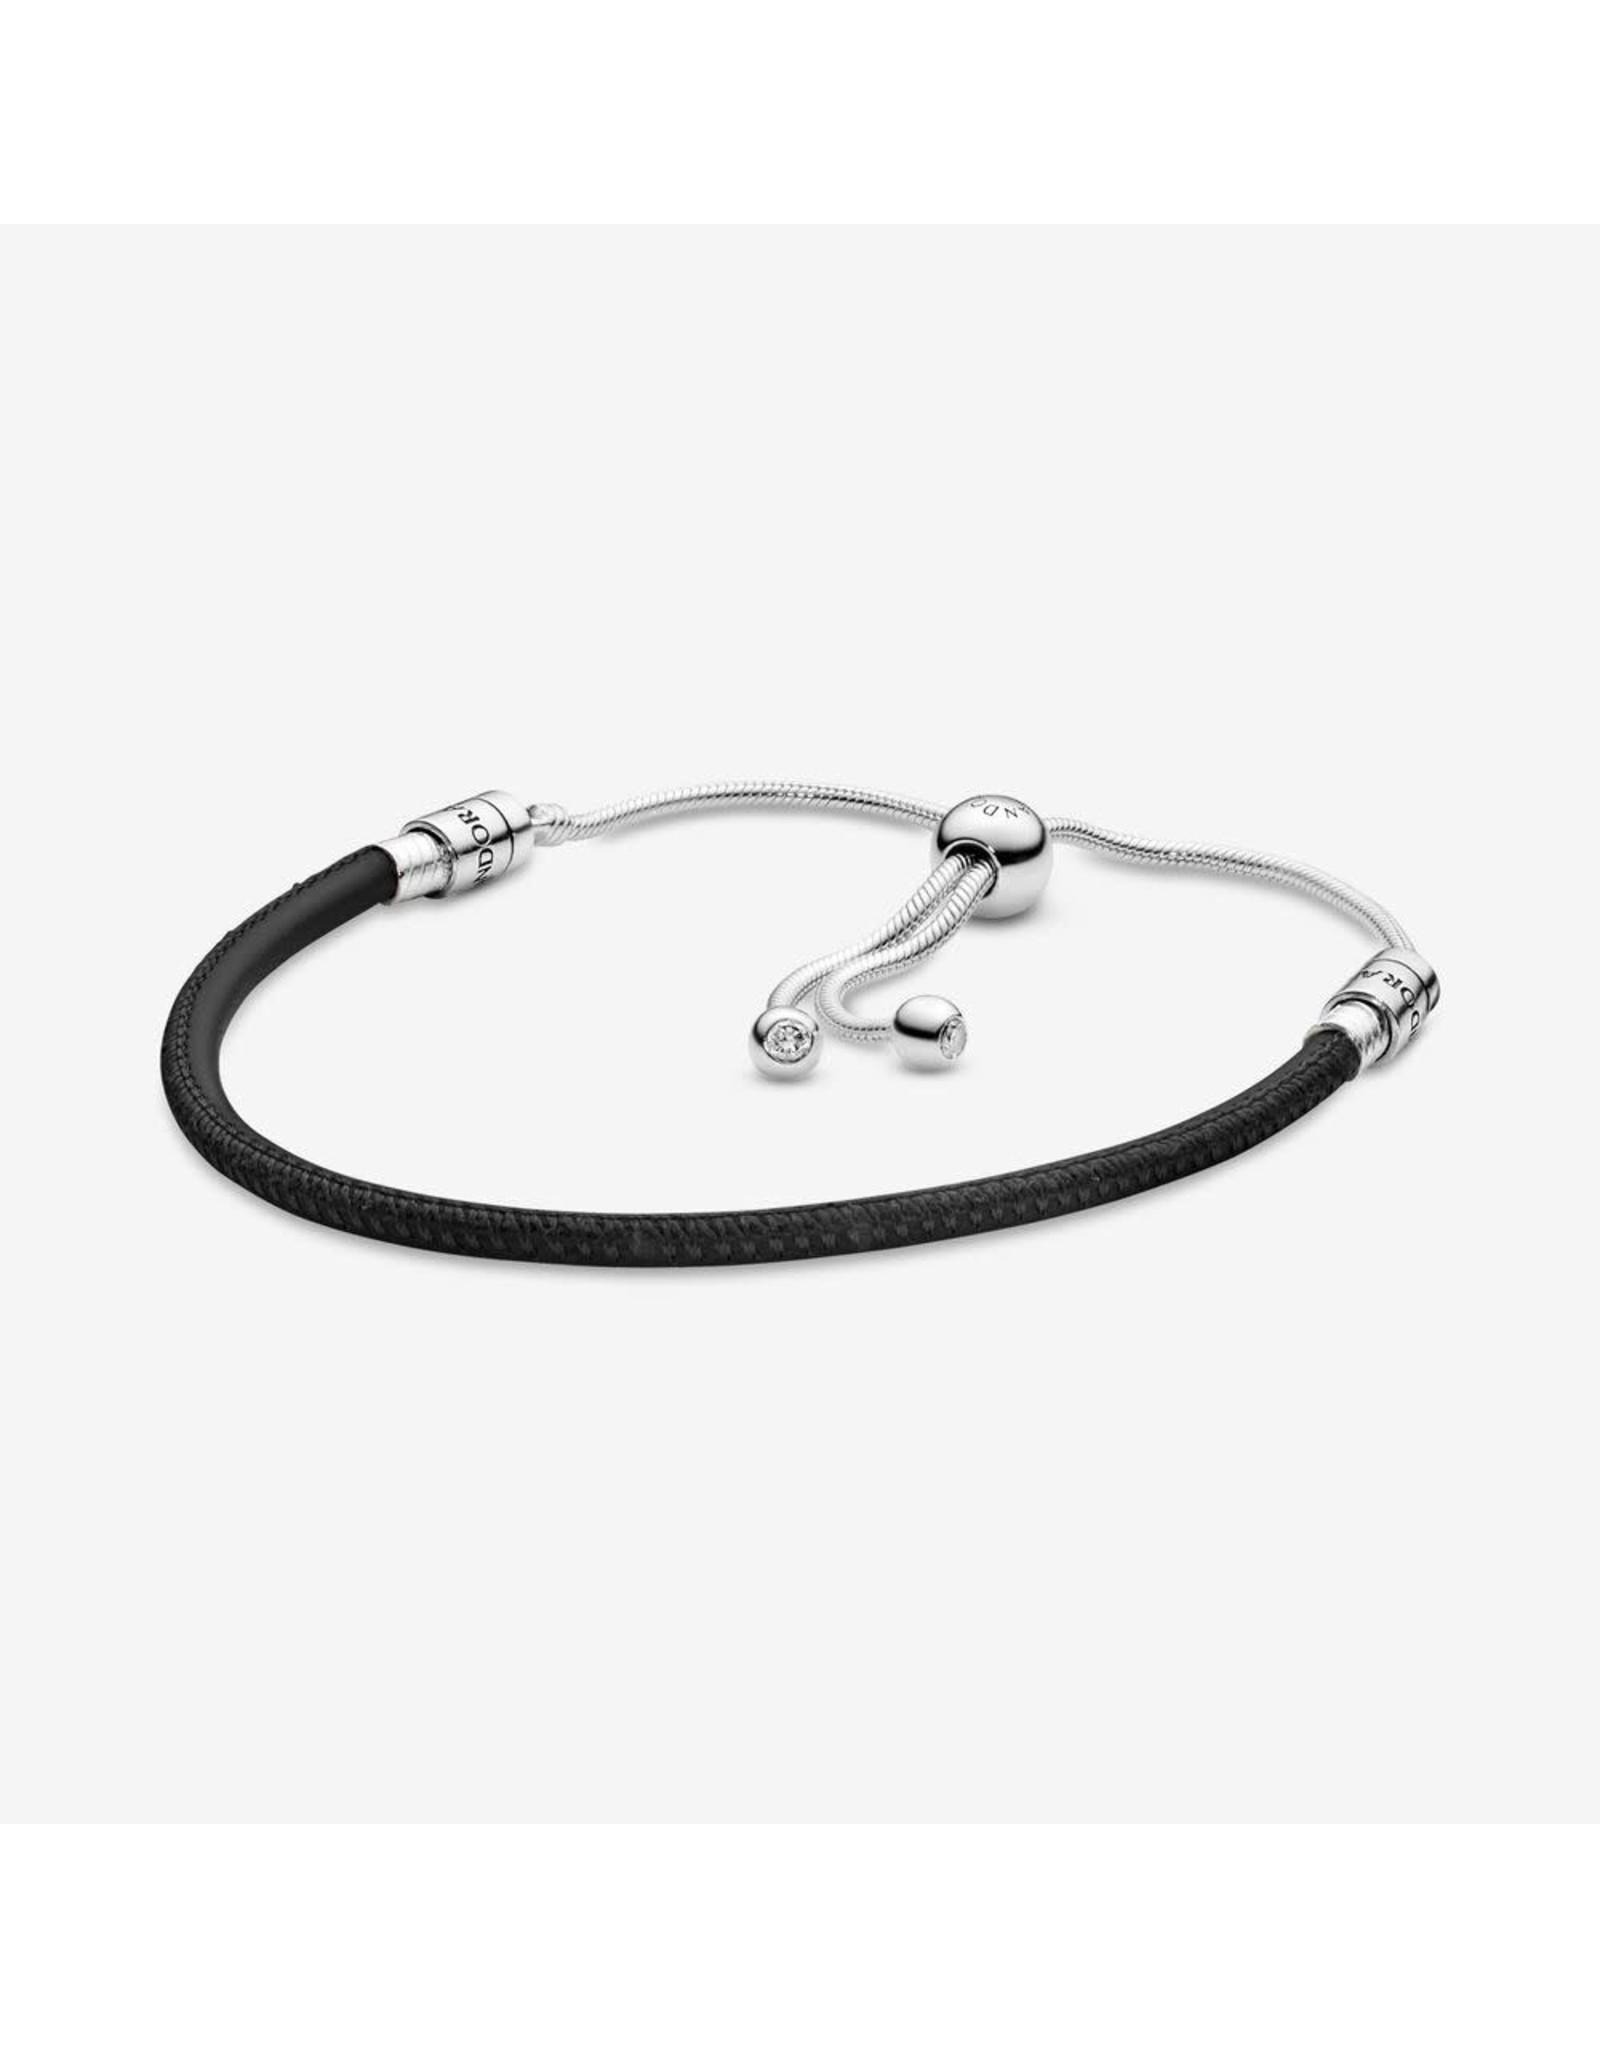 Pandora Pandora (597225CBK)Sliding Clasp Black Leather Bracelet With Ce